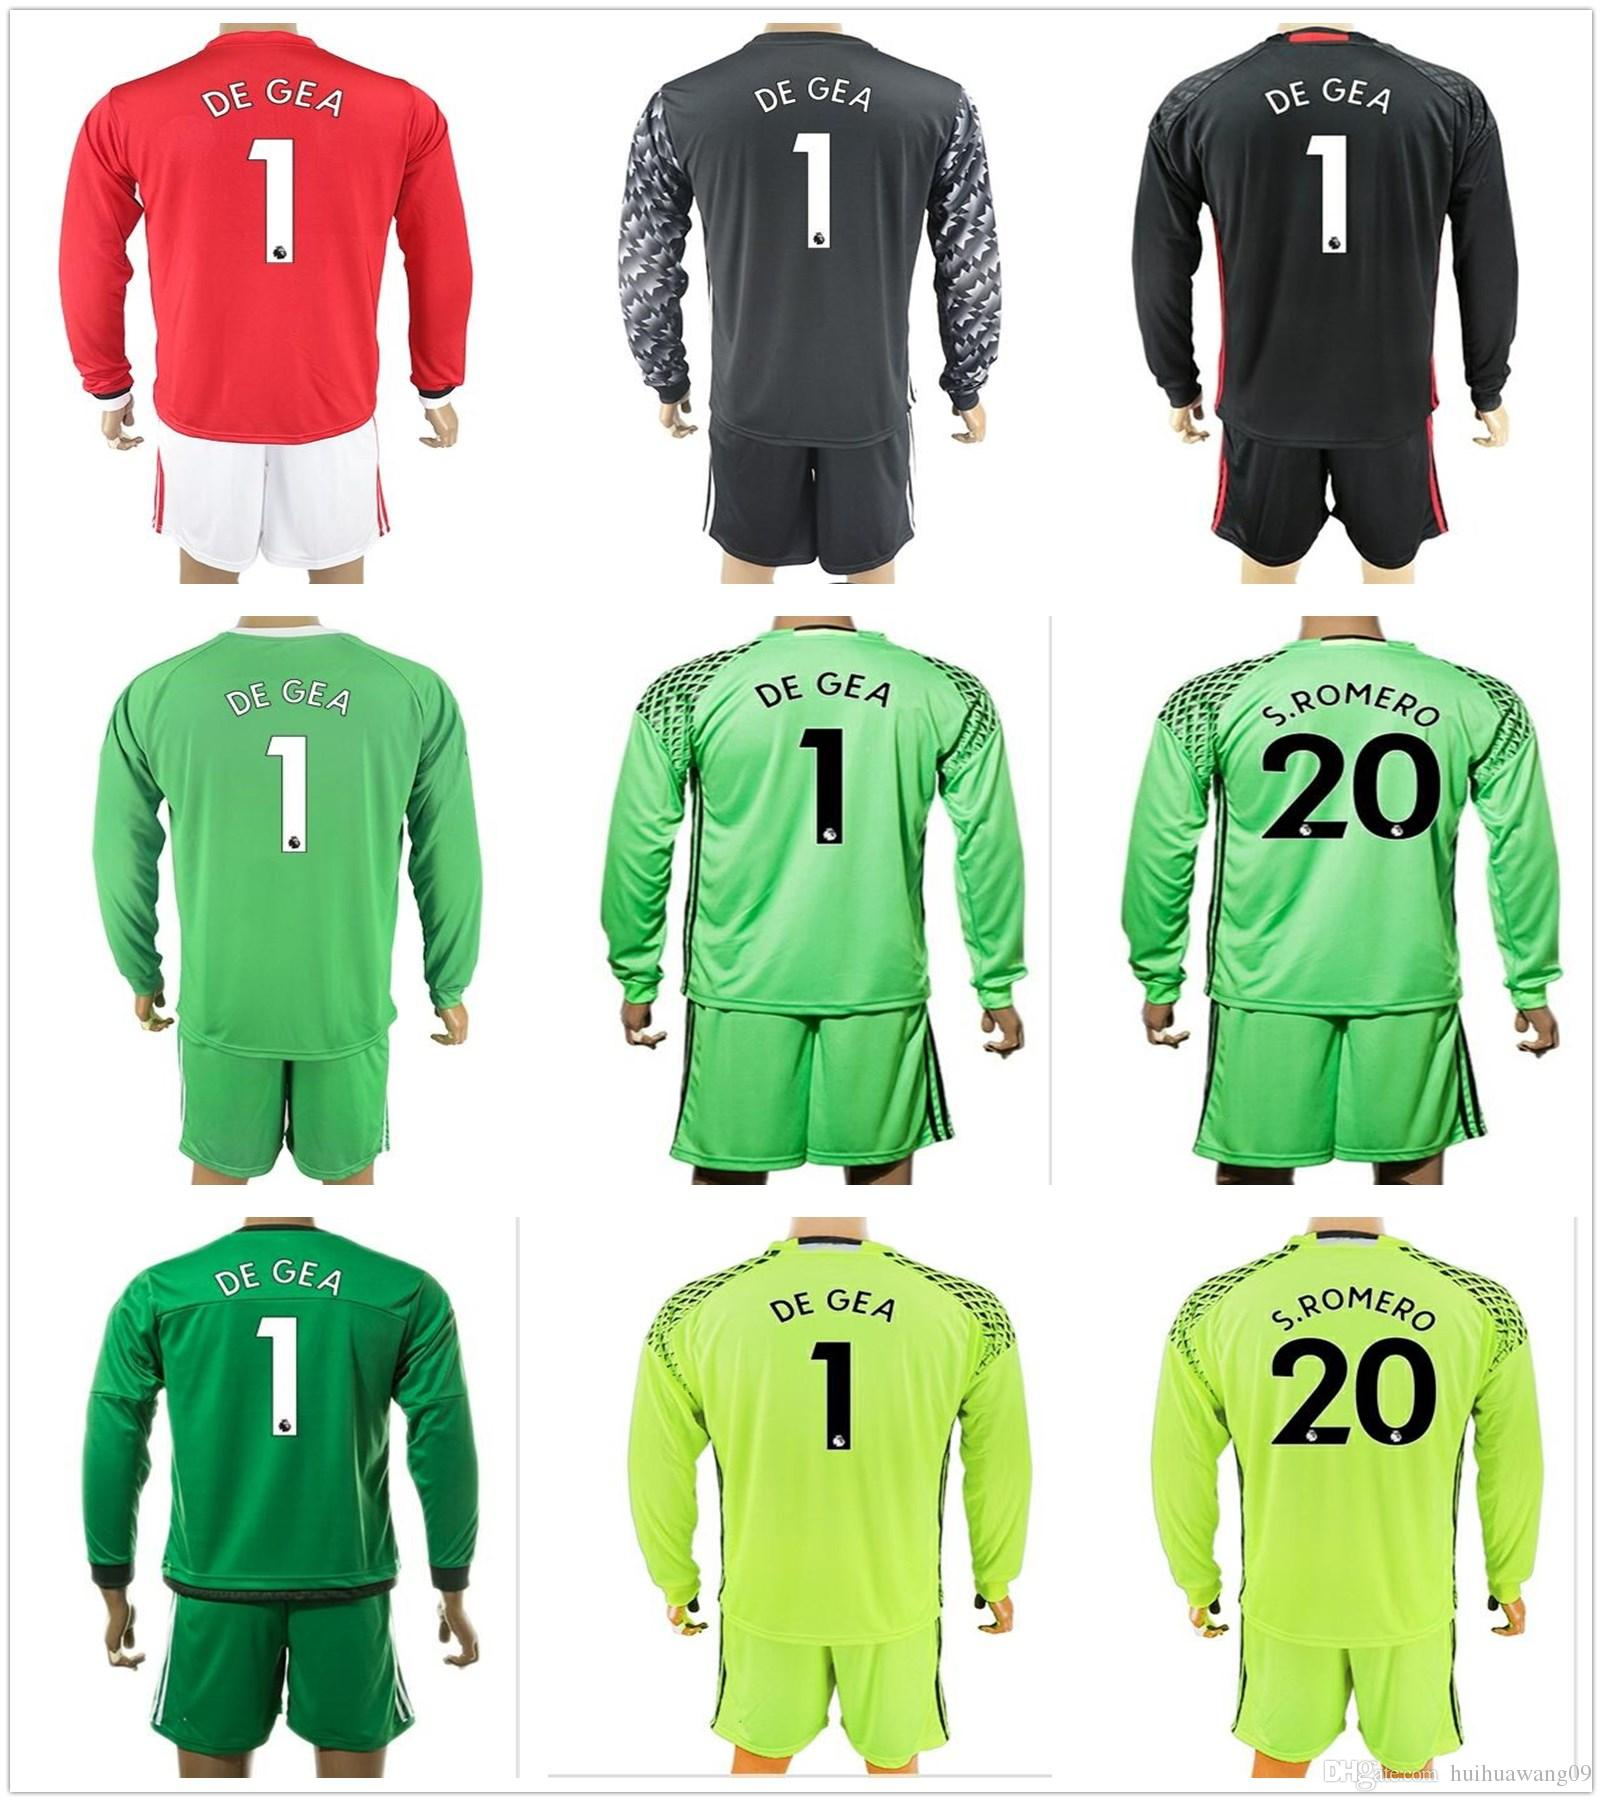 jersey bl 2017 2018 long goalkeeper united kit goalkeeper soccer sets 1 david de gea 20 s.